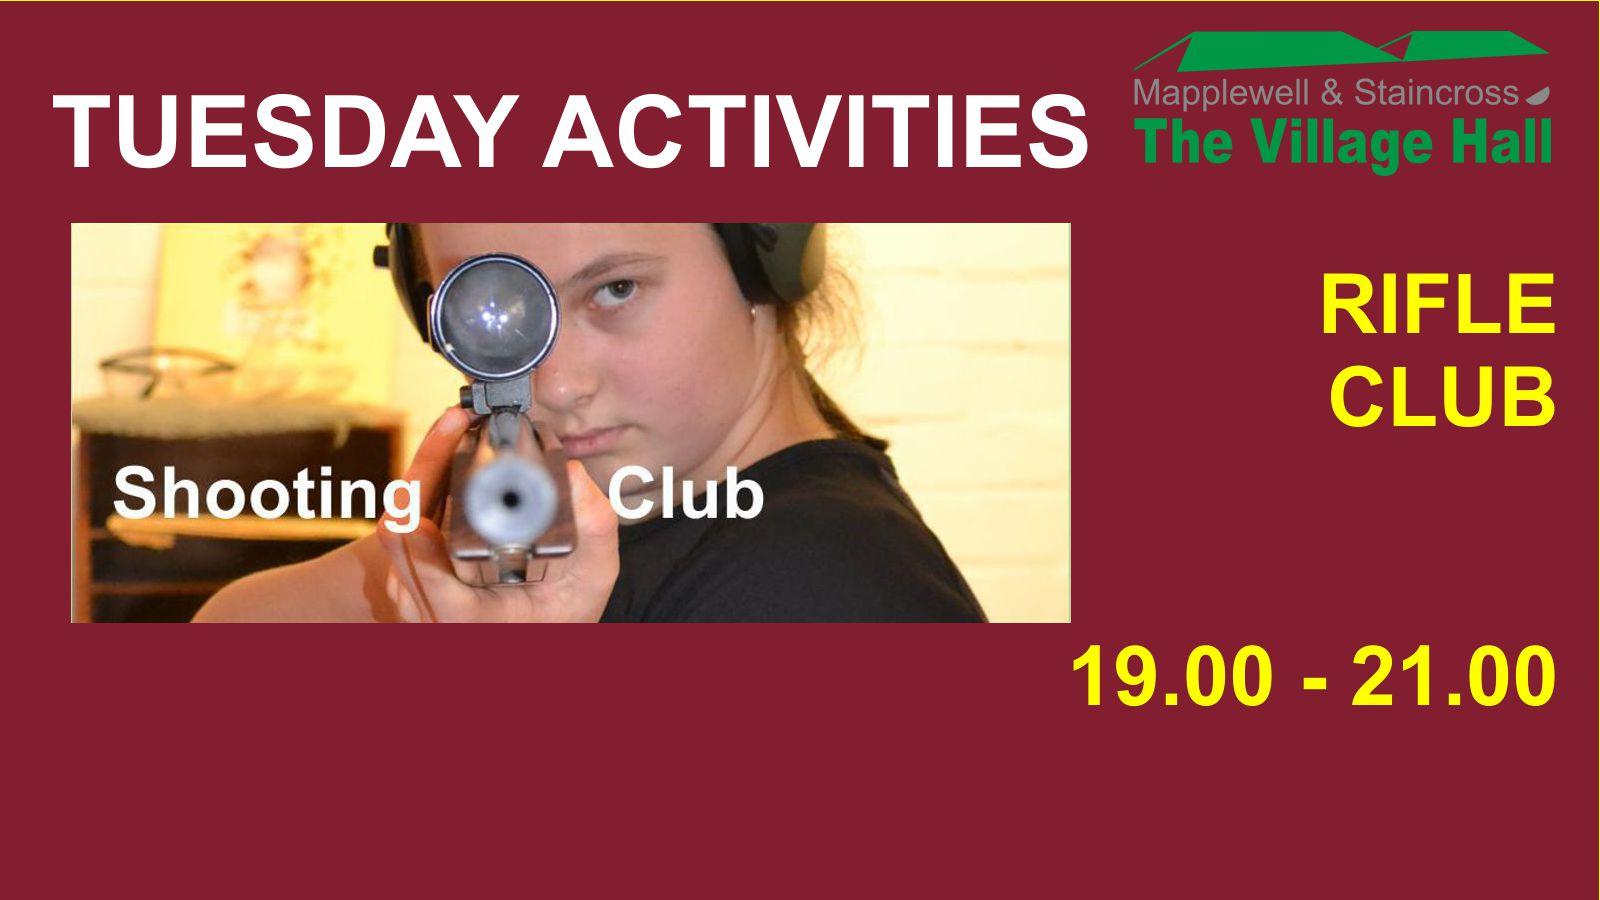 (C) Nick Hibberd - Rifle Club